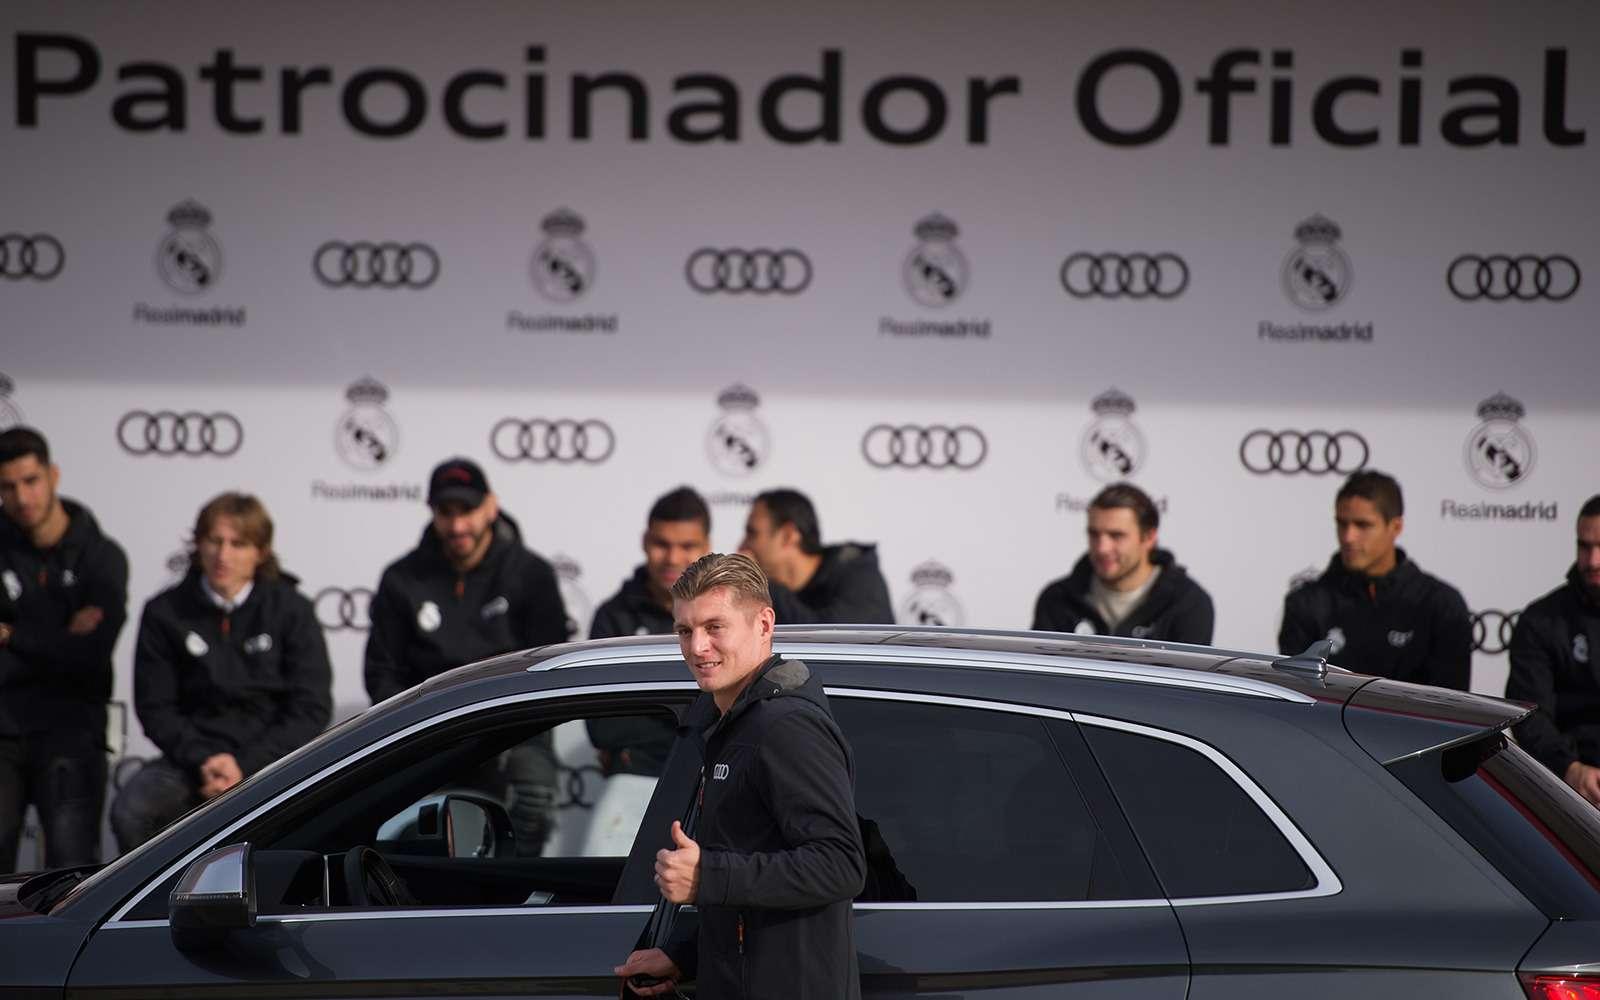 Вотэто спонсор! Audi раздала футболистам «Реала» машины— фото 819842